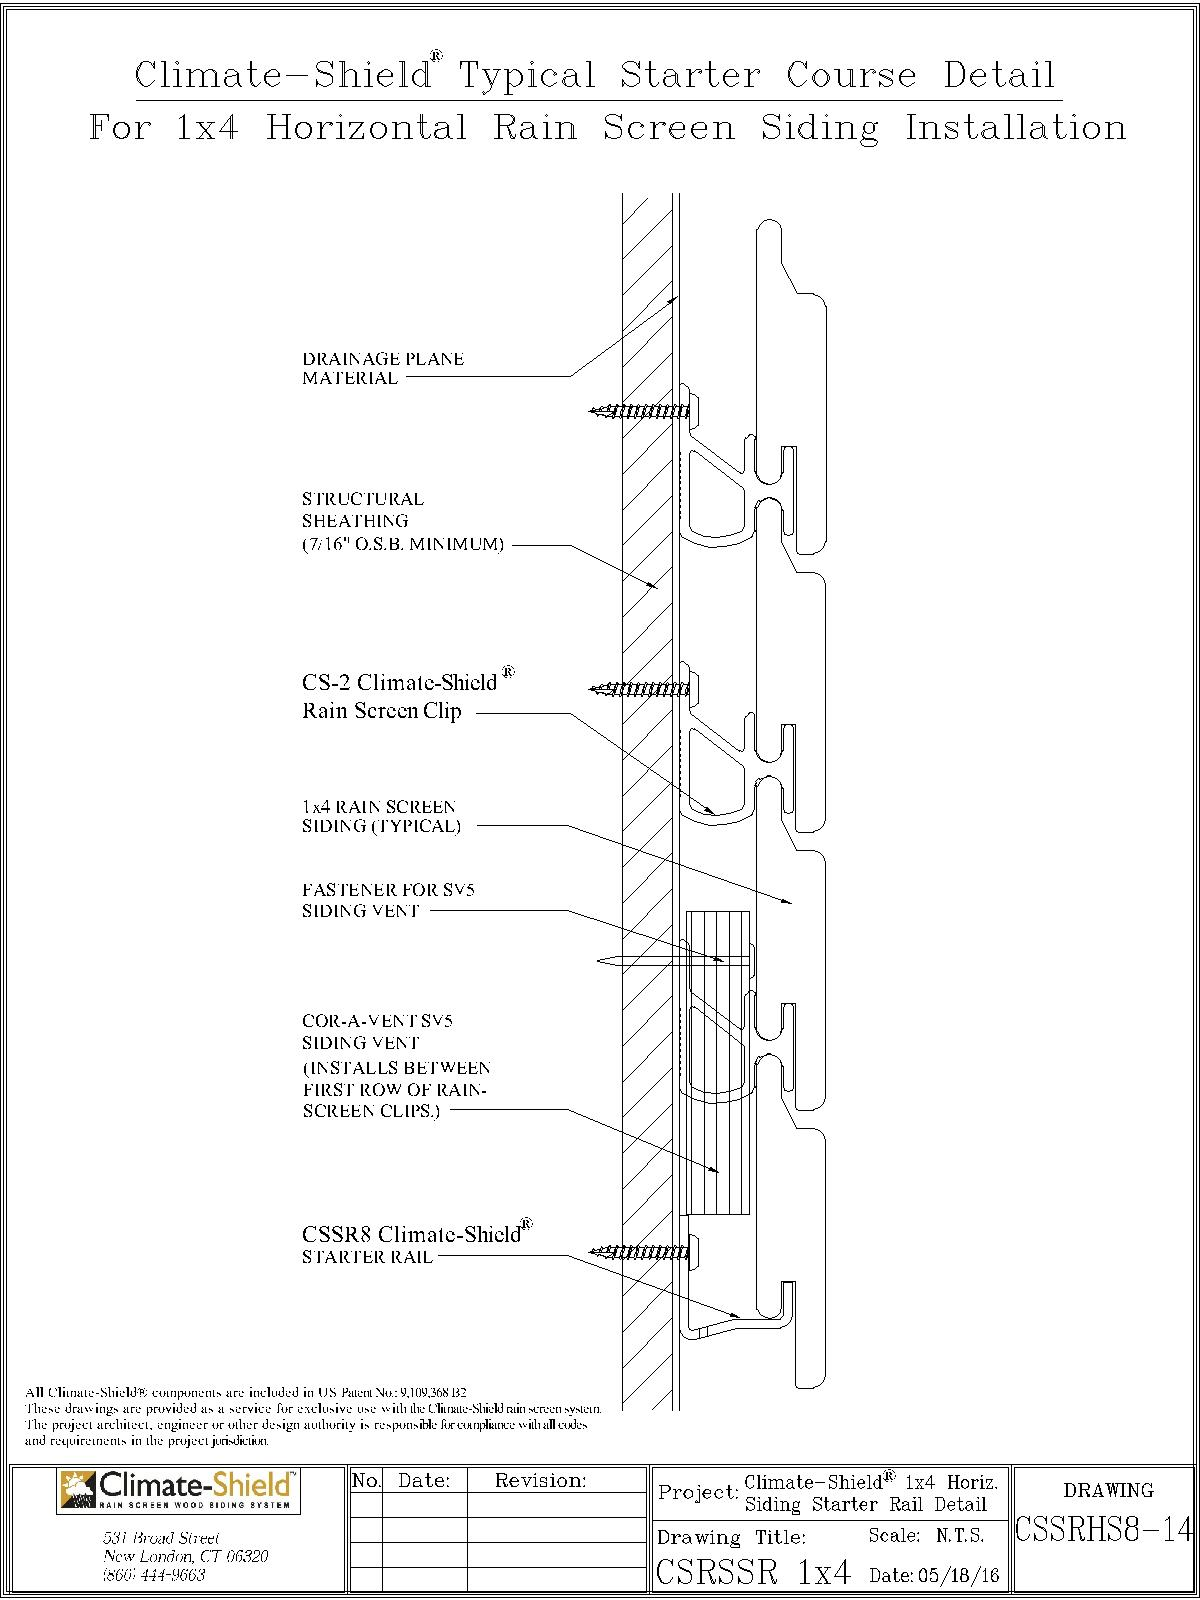 CSSRHS8-14_1x4_Starter_Rail_Detail.jpg